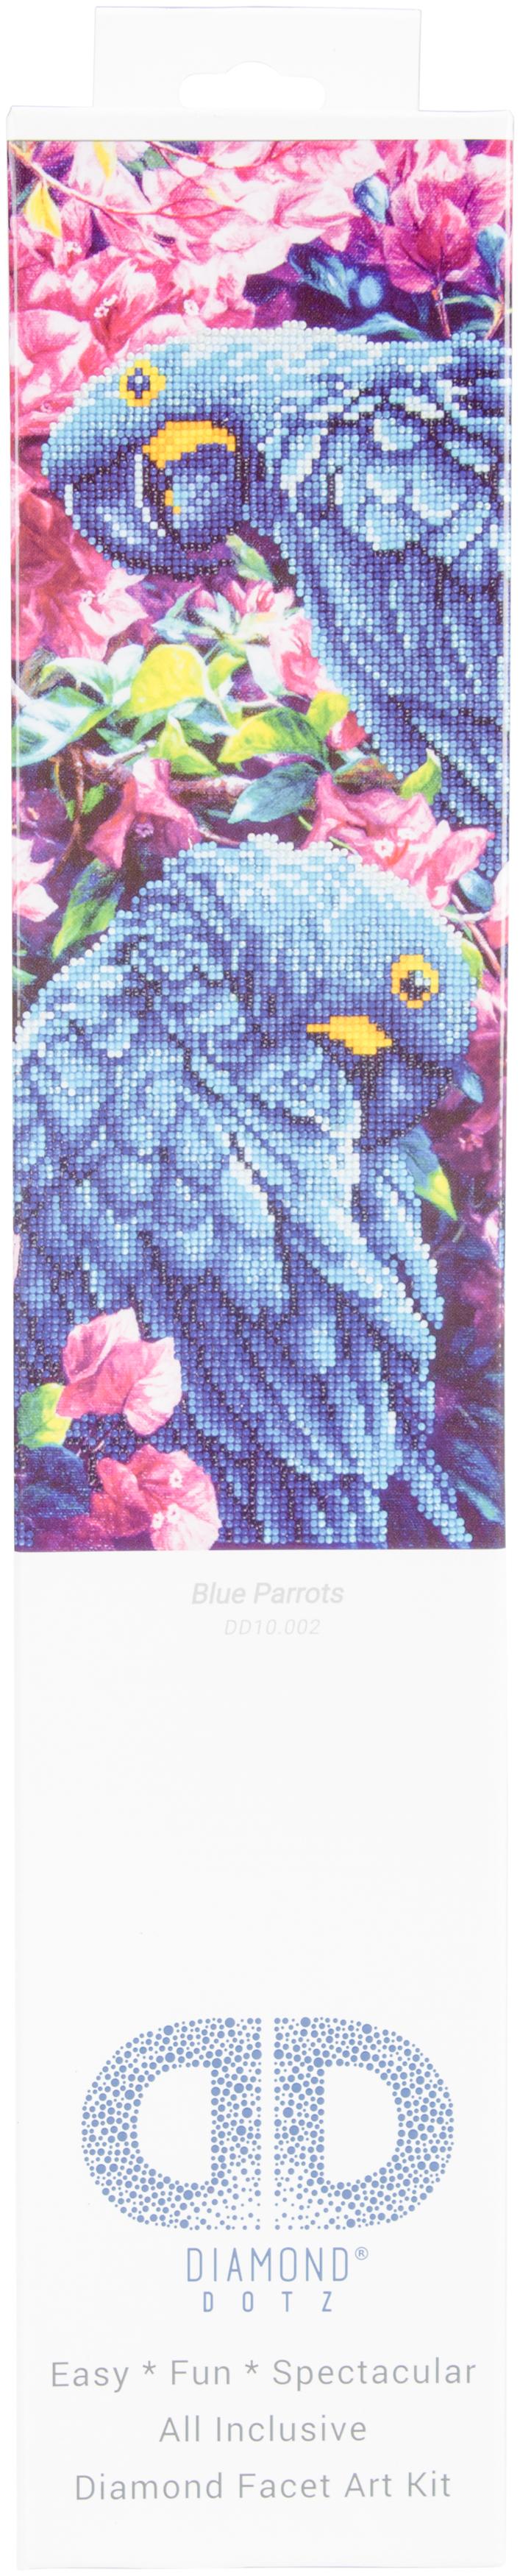 Diamond Dotz Diamond Embroidery Facet Art Kit 23.5X17.75-Blue Parrot